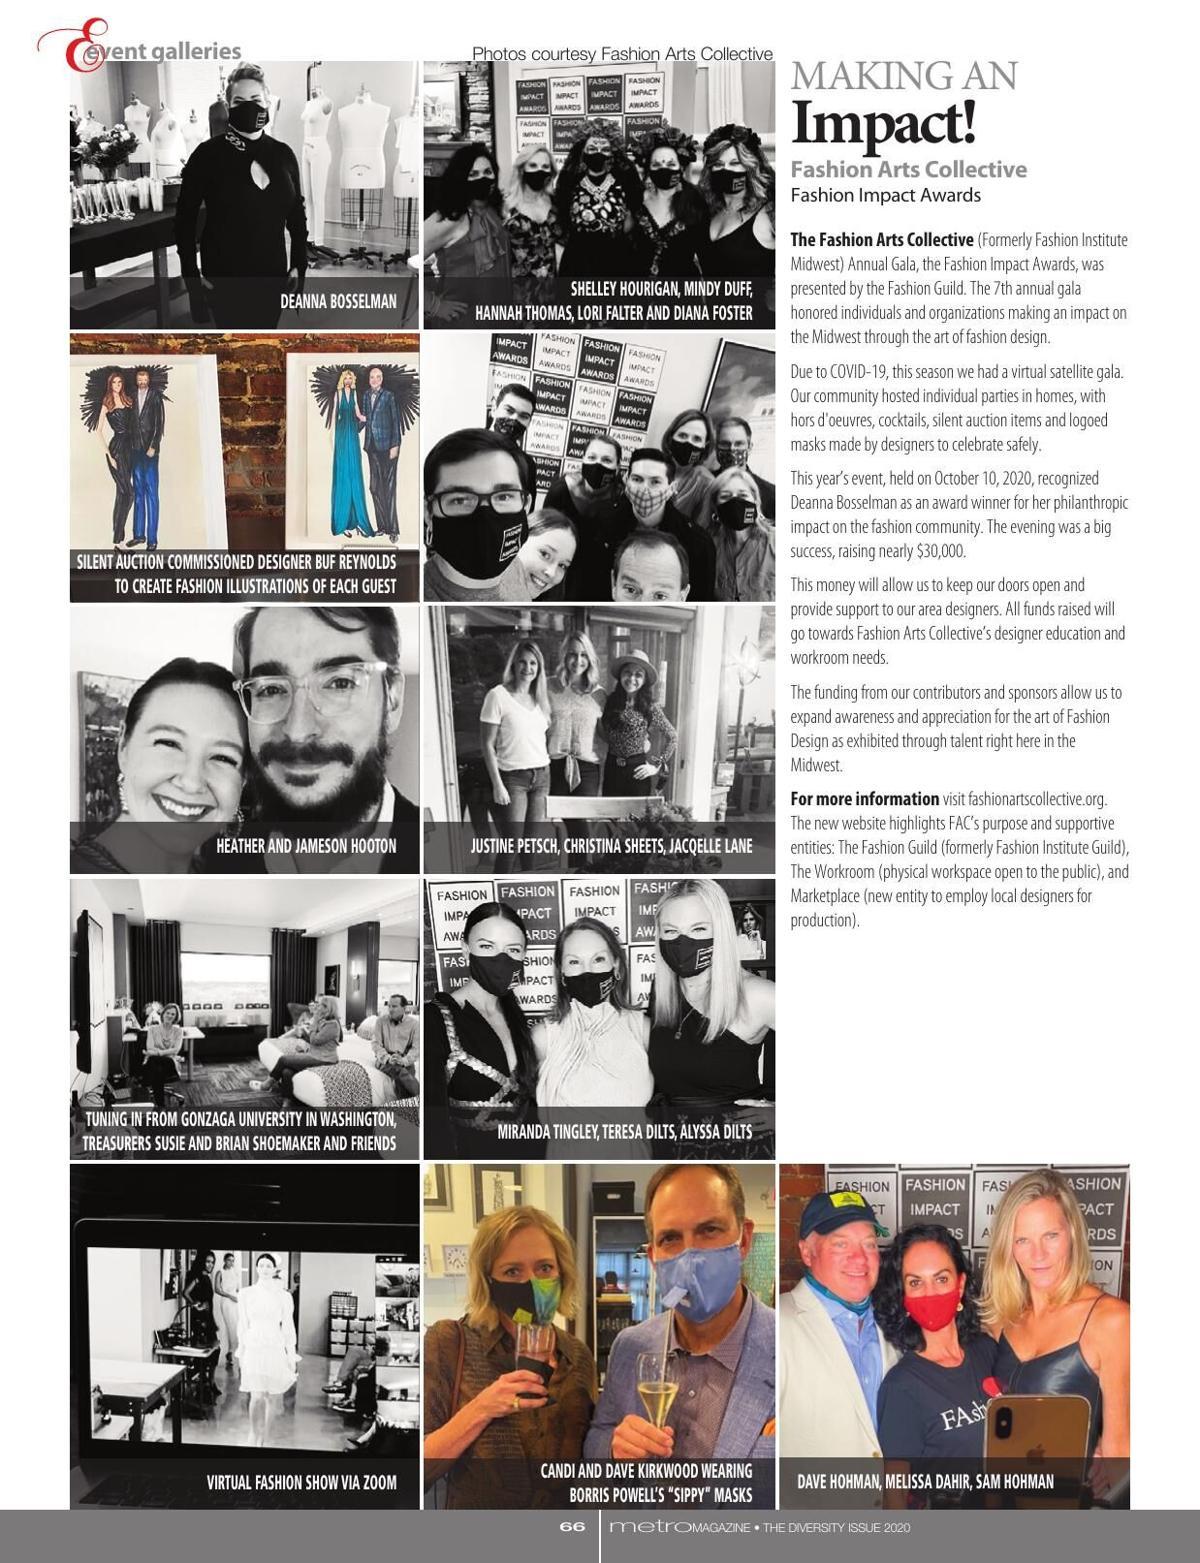 websiteonlymetroMAGAZINE-1020 68.pdf